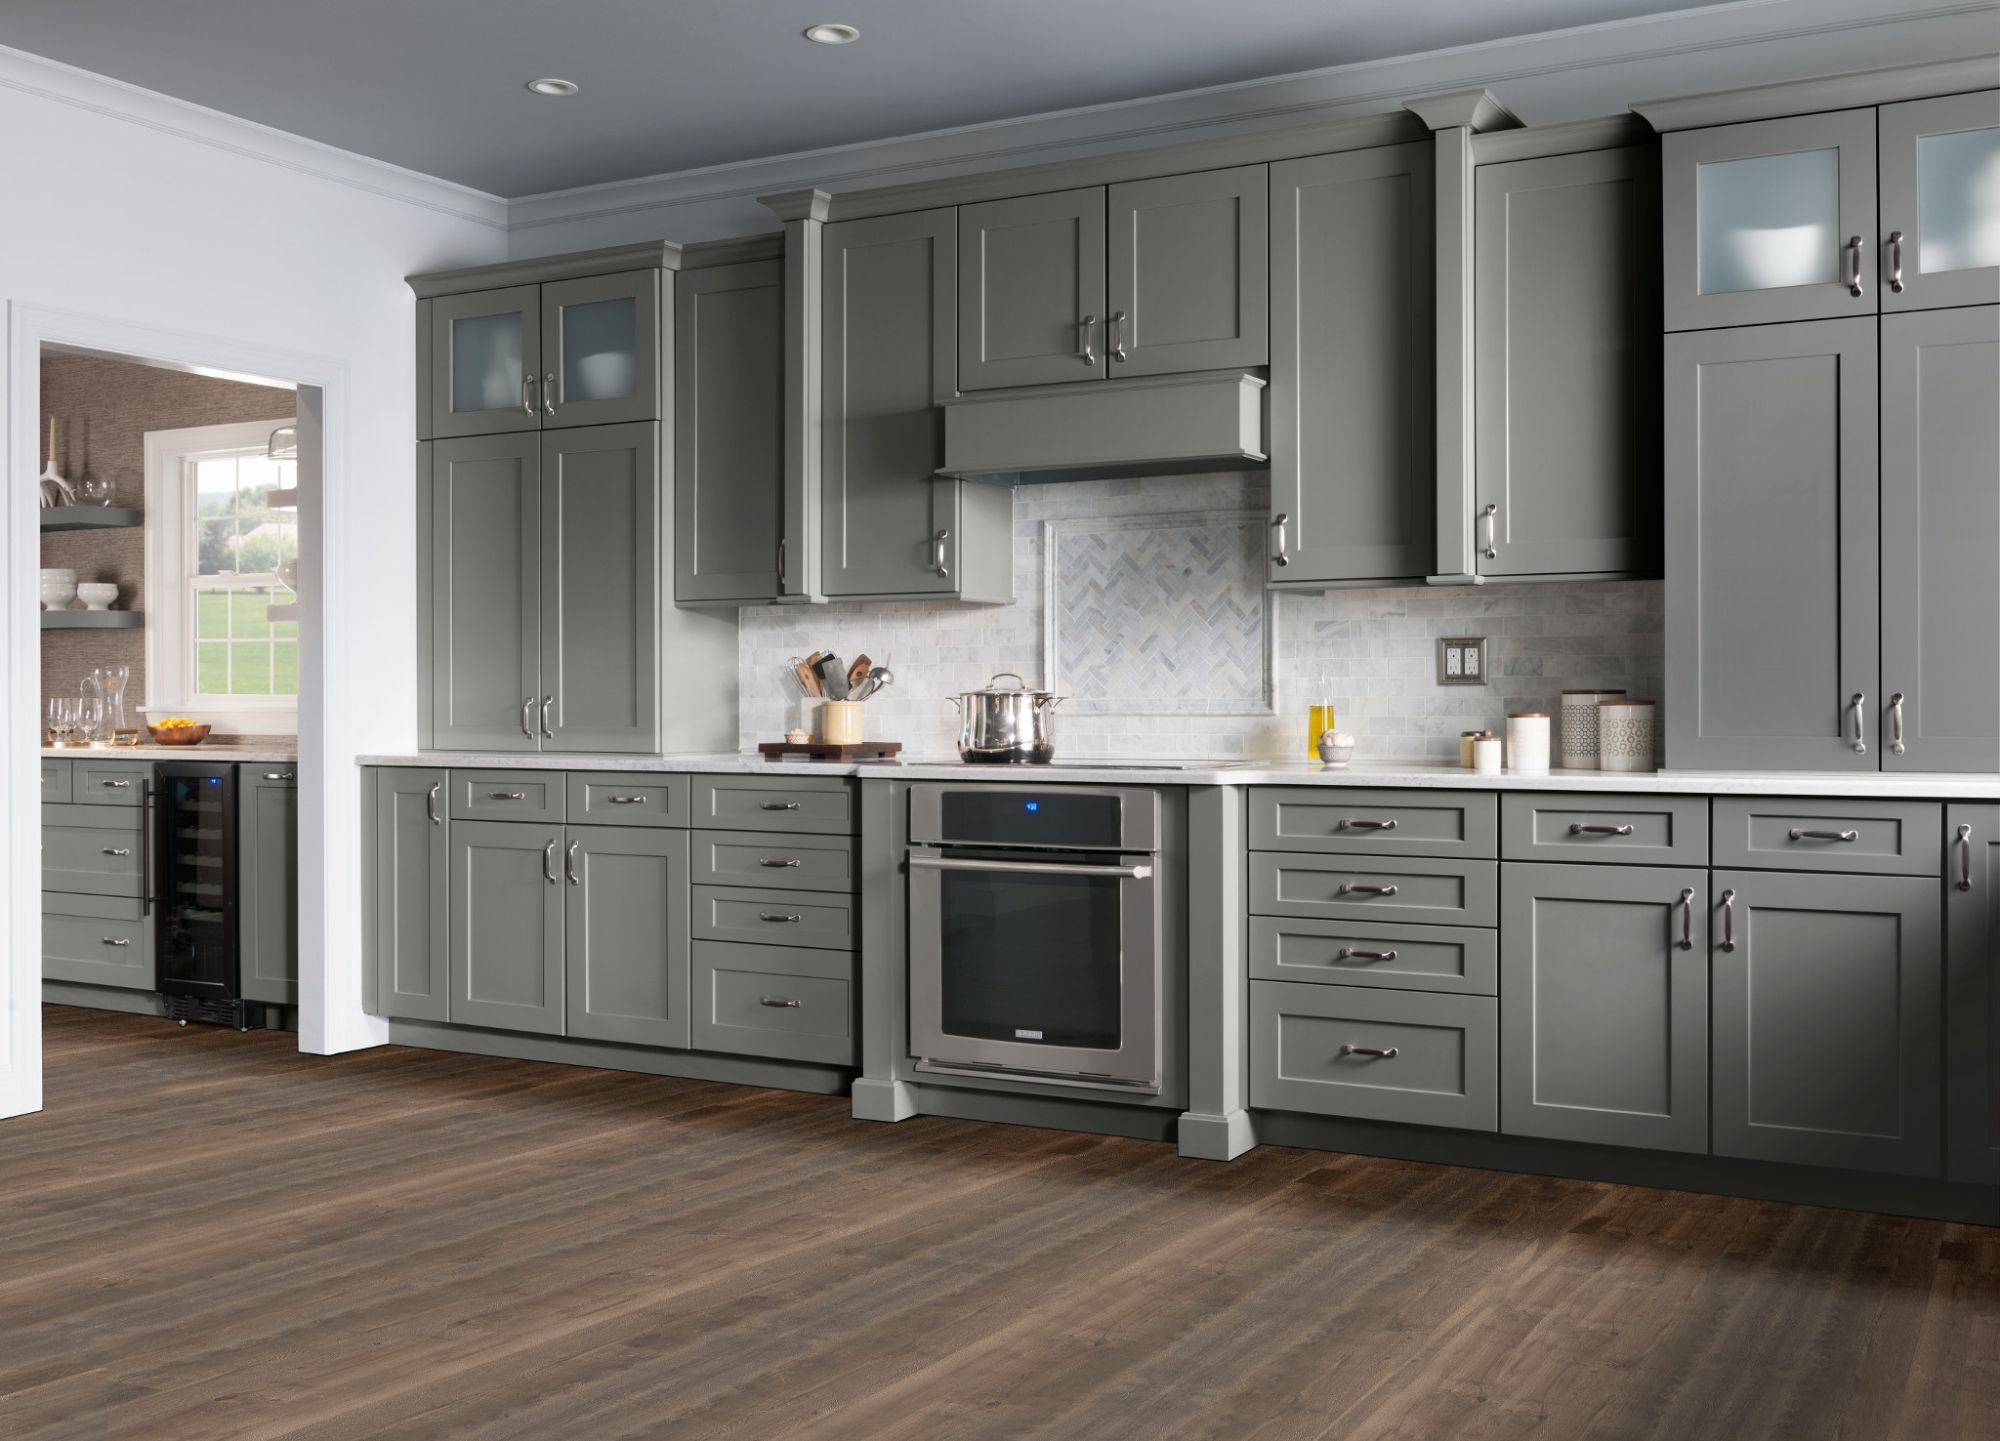 shenandoah cabinets mission shaker style kitchen cabinets kitchen cabinet styles kitchen on kitchen hutch id=19421